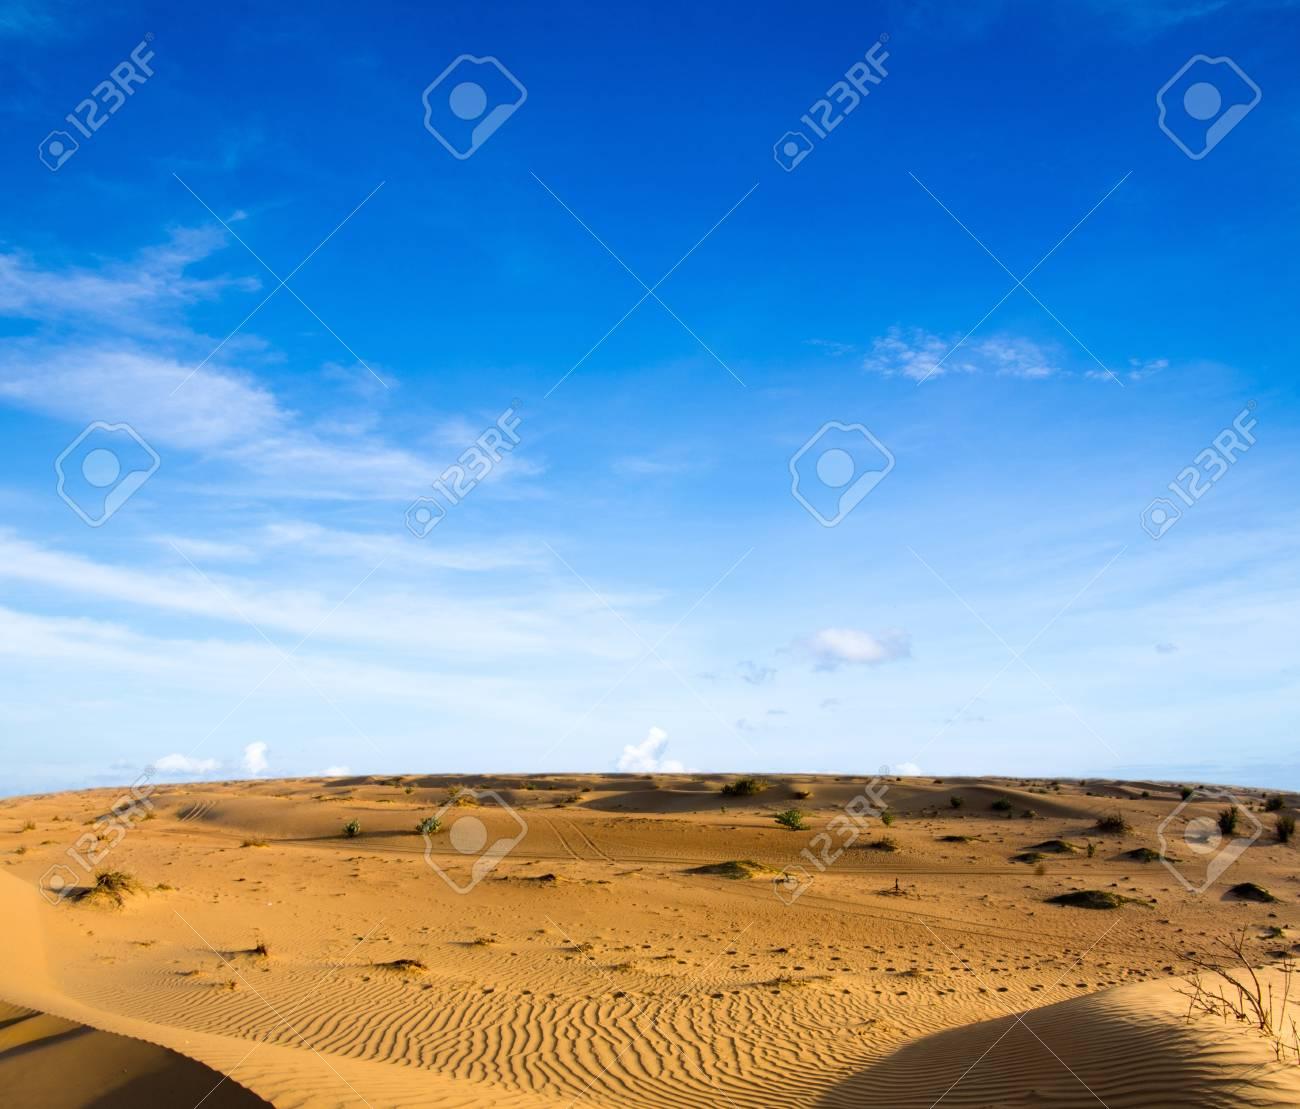 Desert landscape with blue sky Stock Photo - 16604019